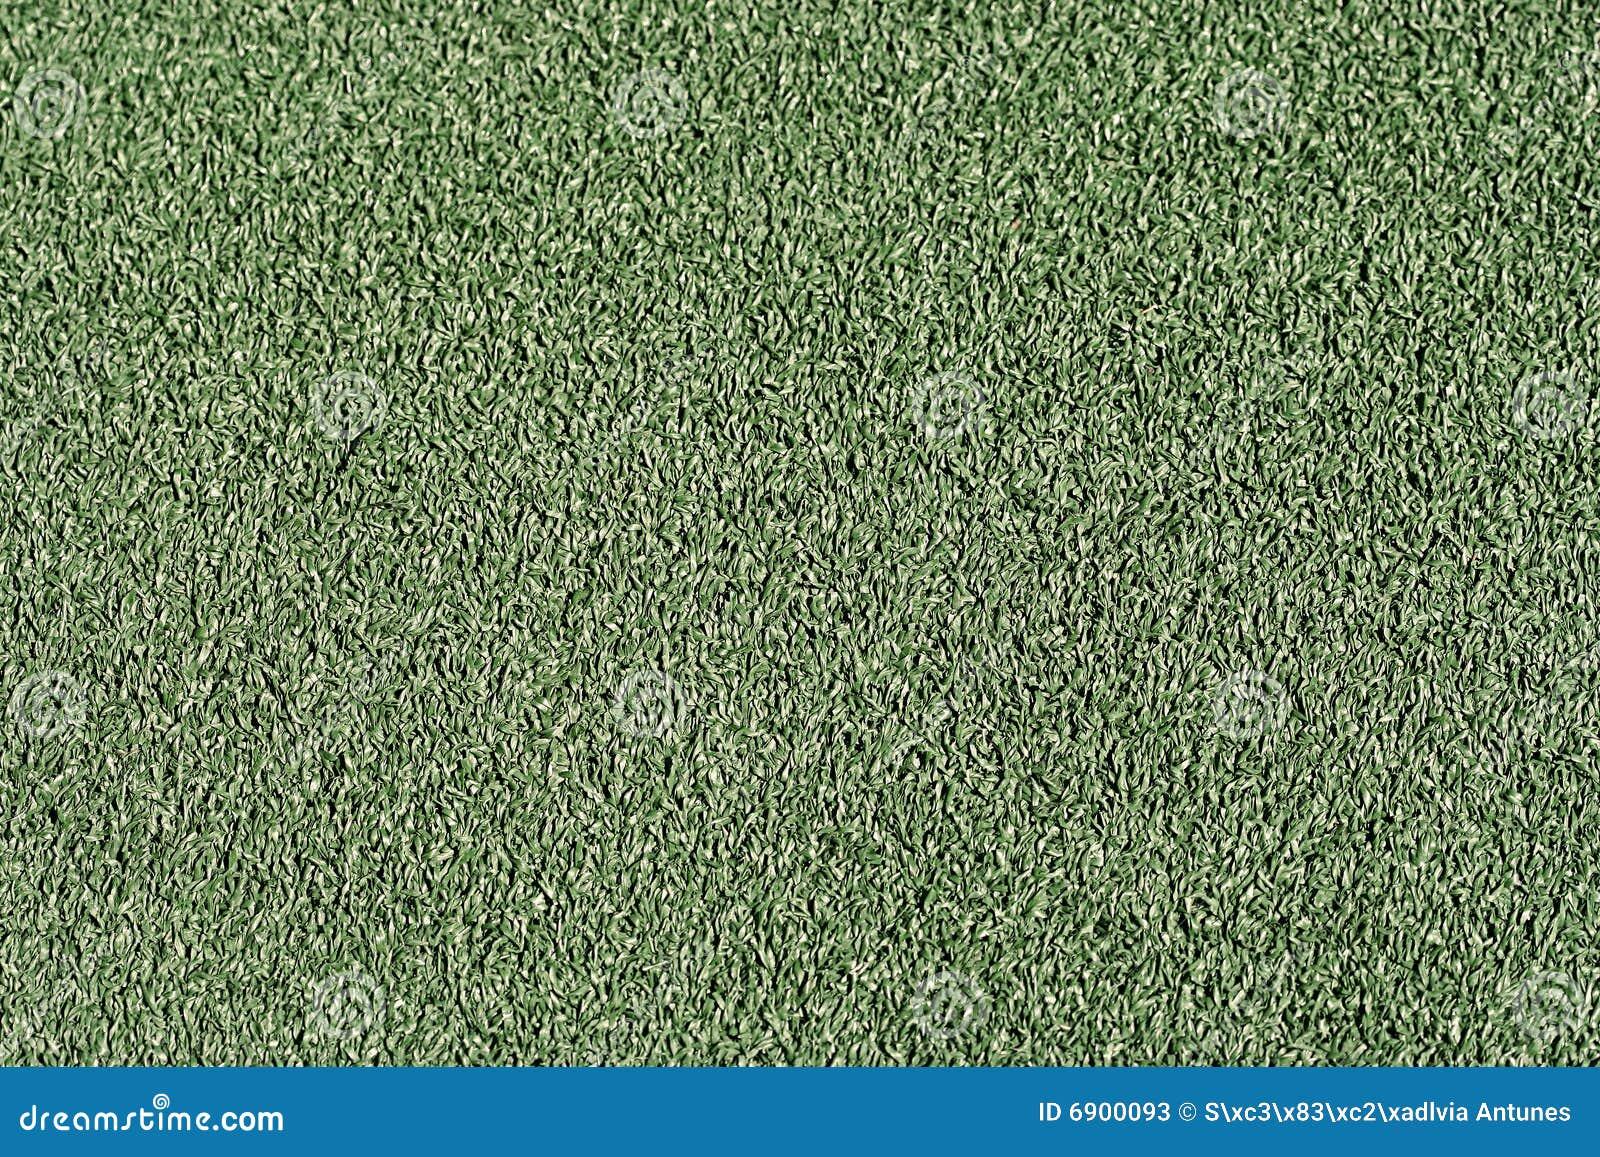 Groen kunstmatig gras